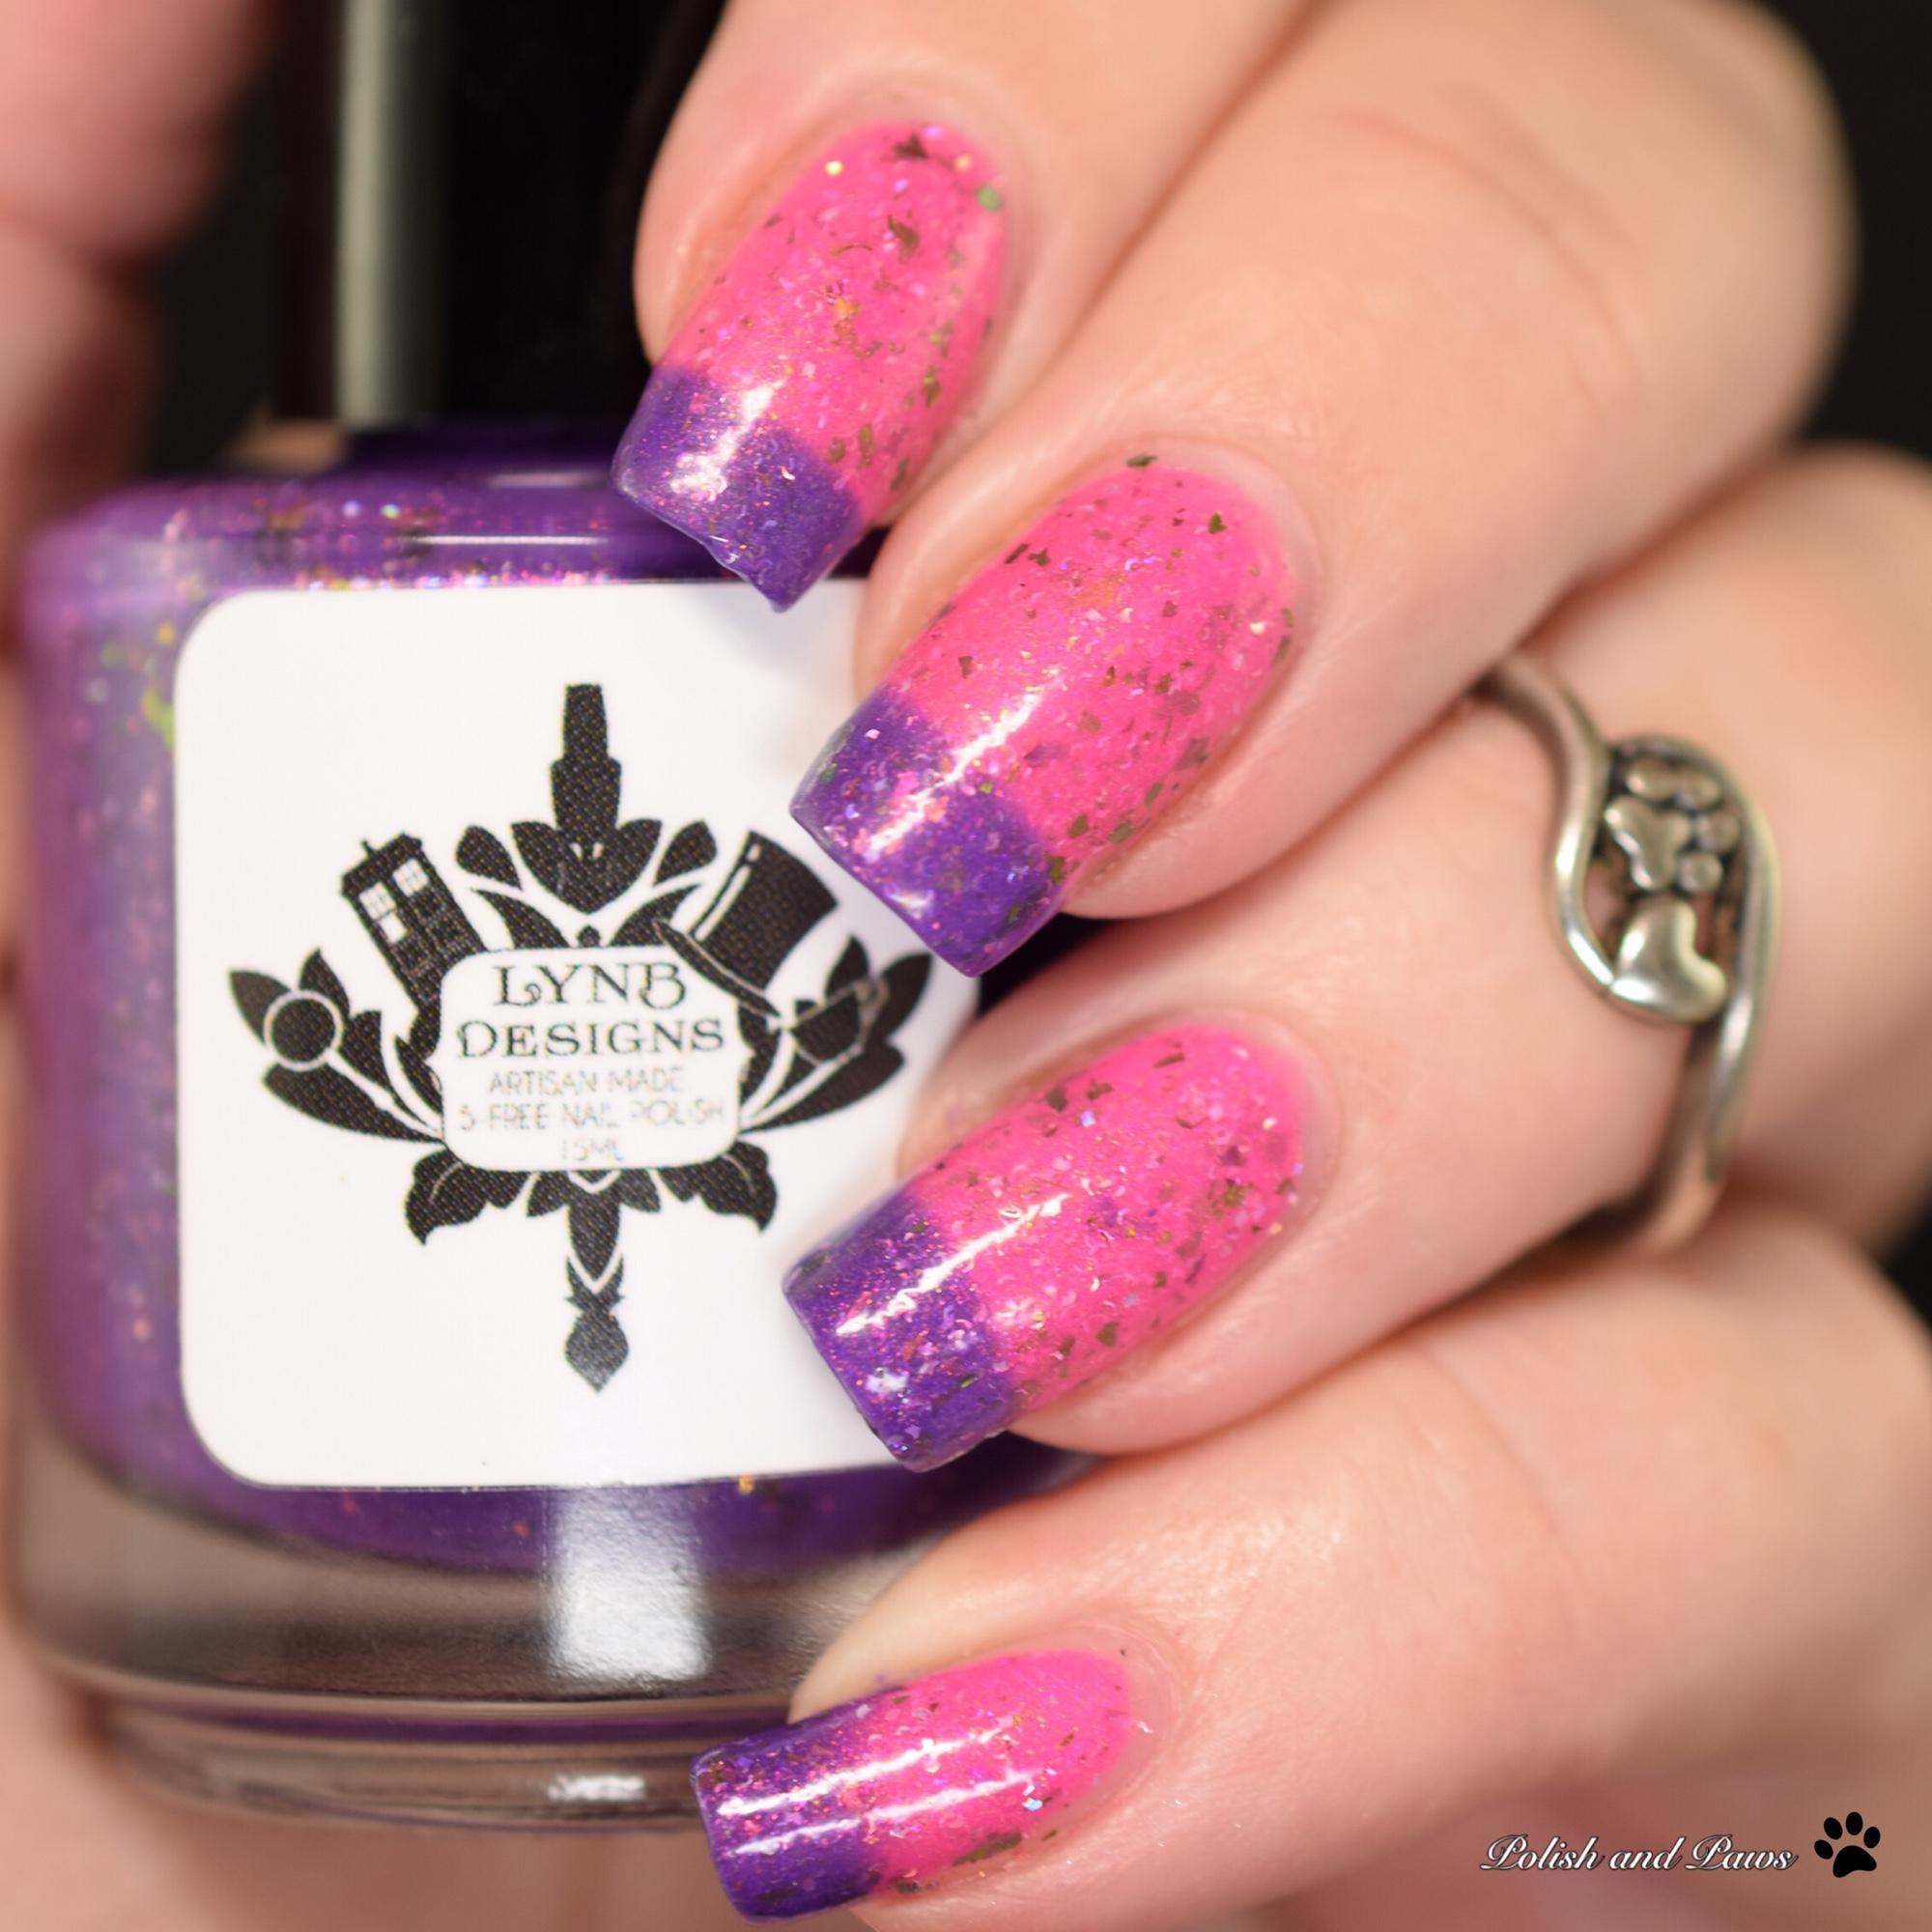 LynB Designs Single and Ready to Flamingle